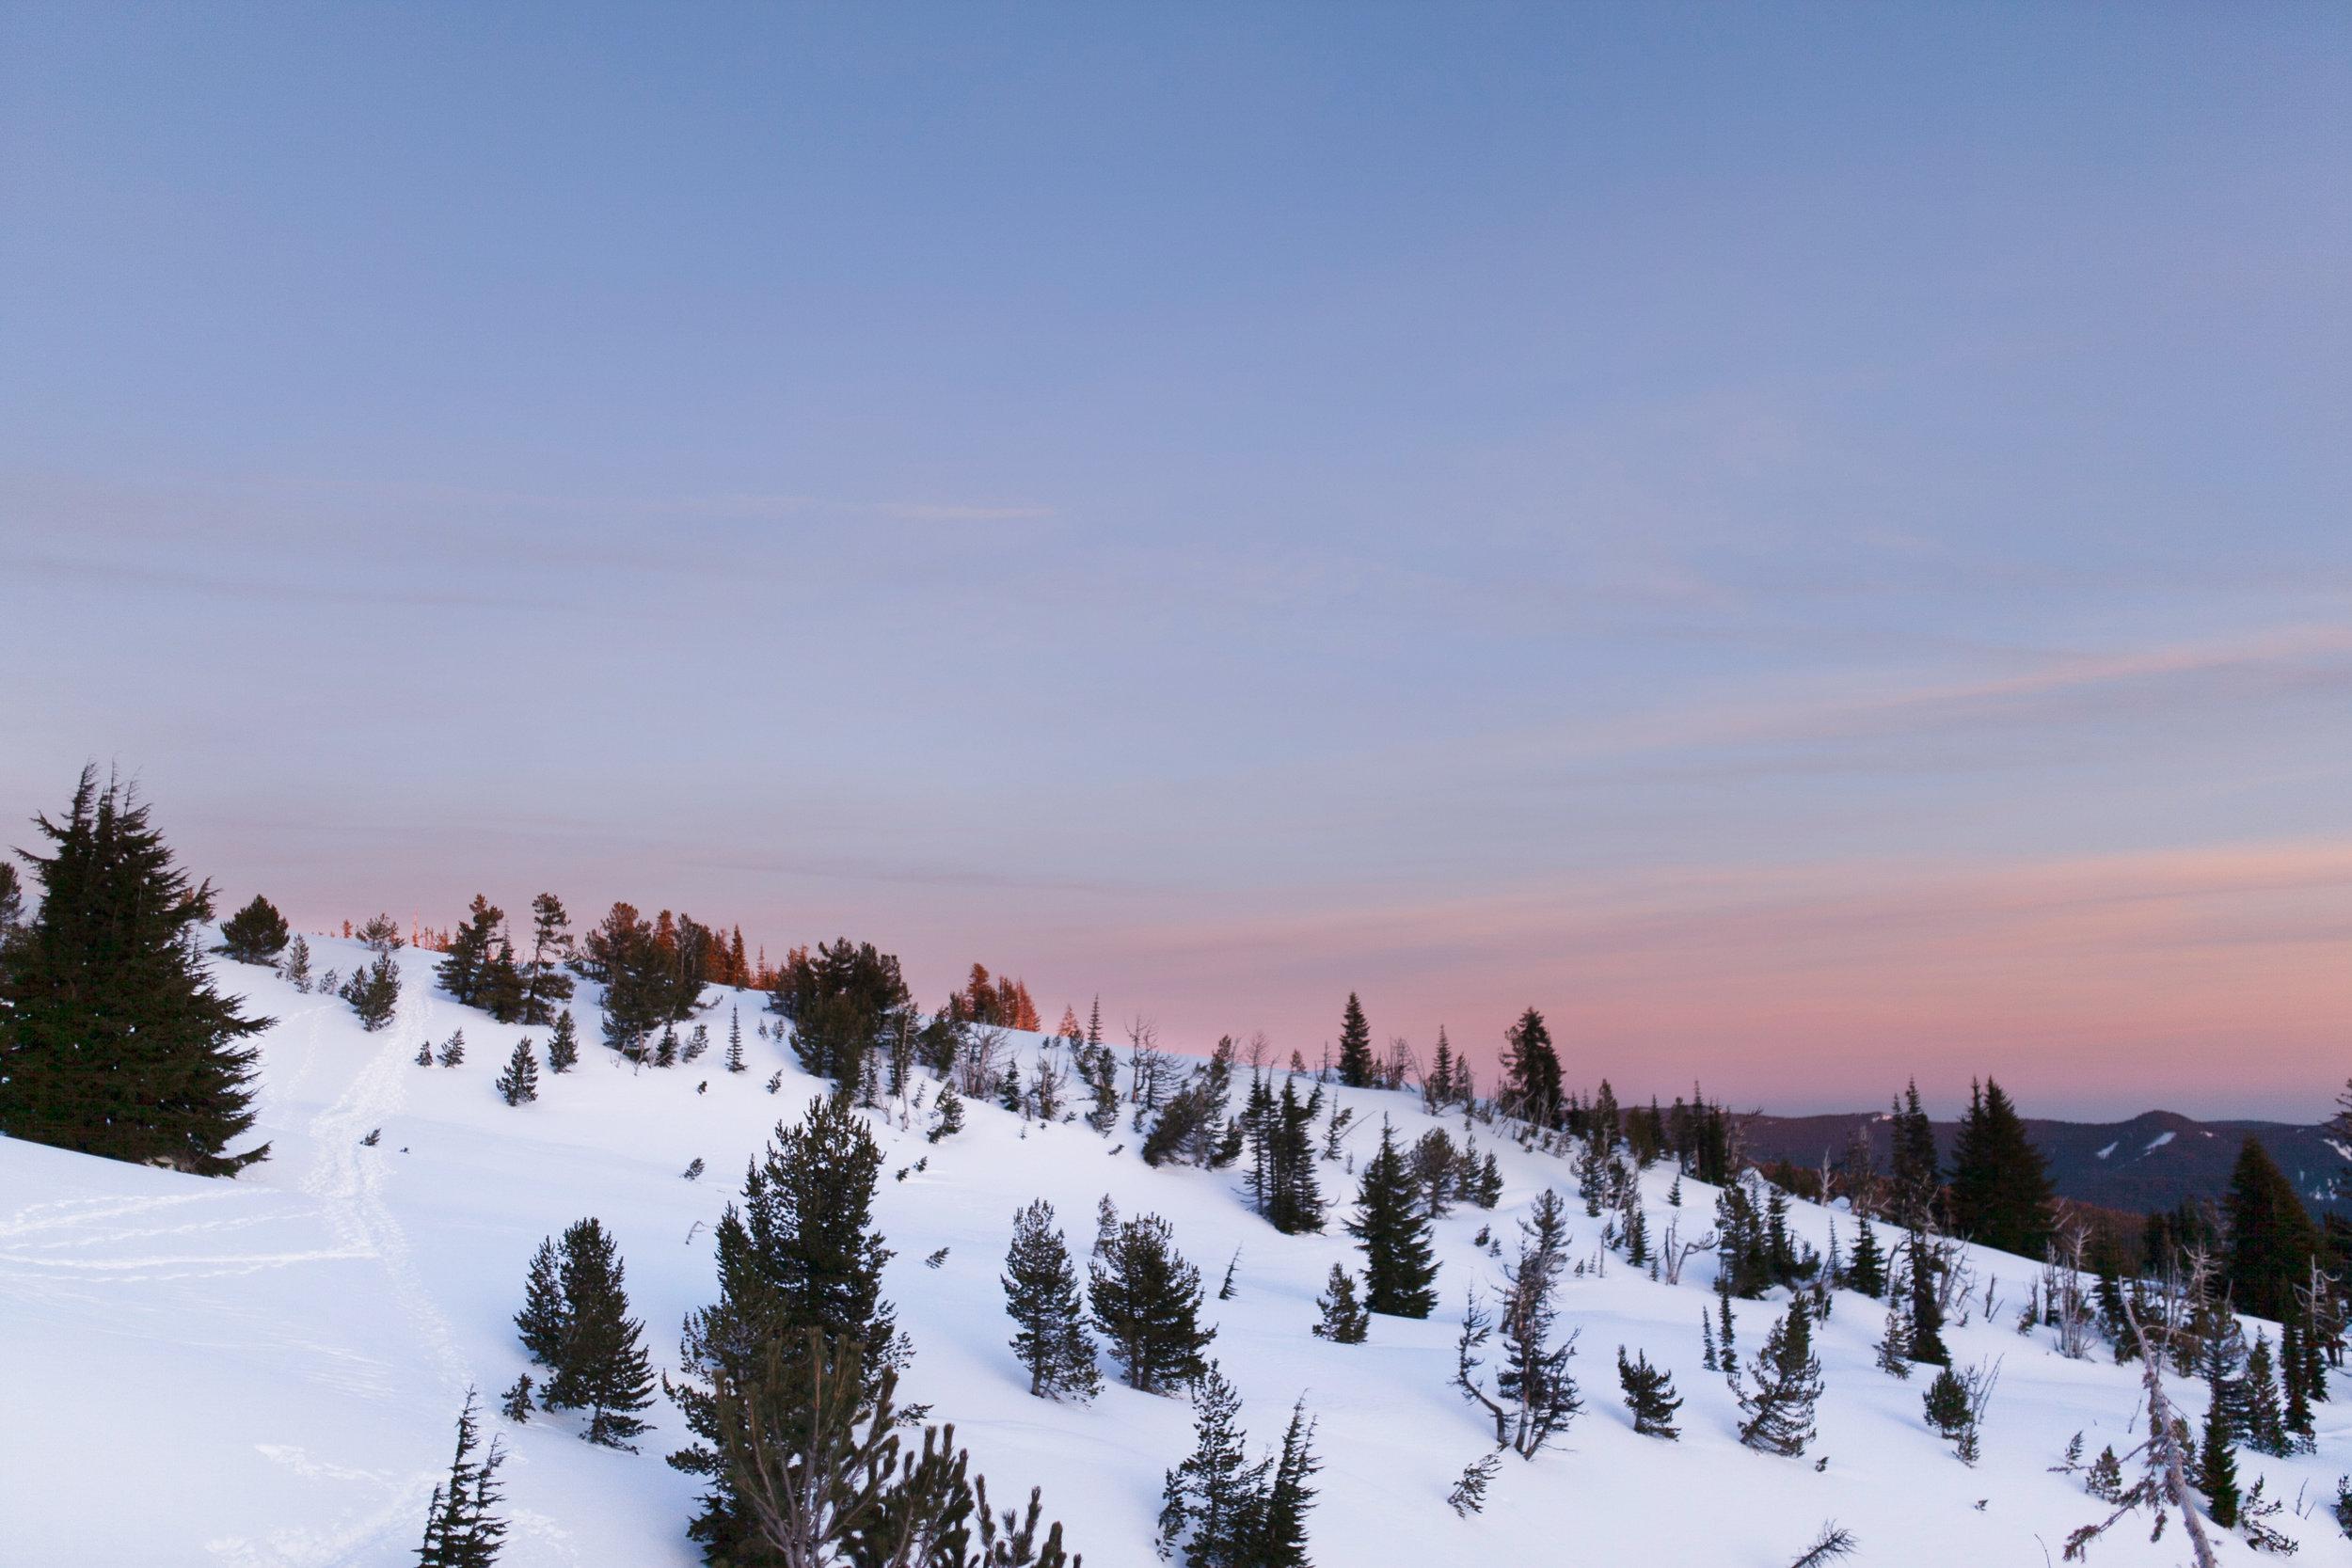 090Travel_Adventure_Outdoor_Photography_Outlive_Creative_Oregon_Mount_Hood_Timberline.jpg